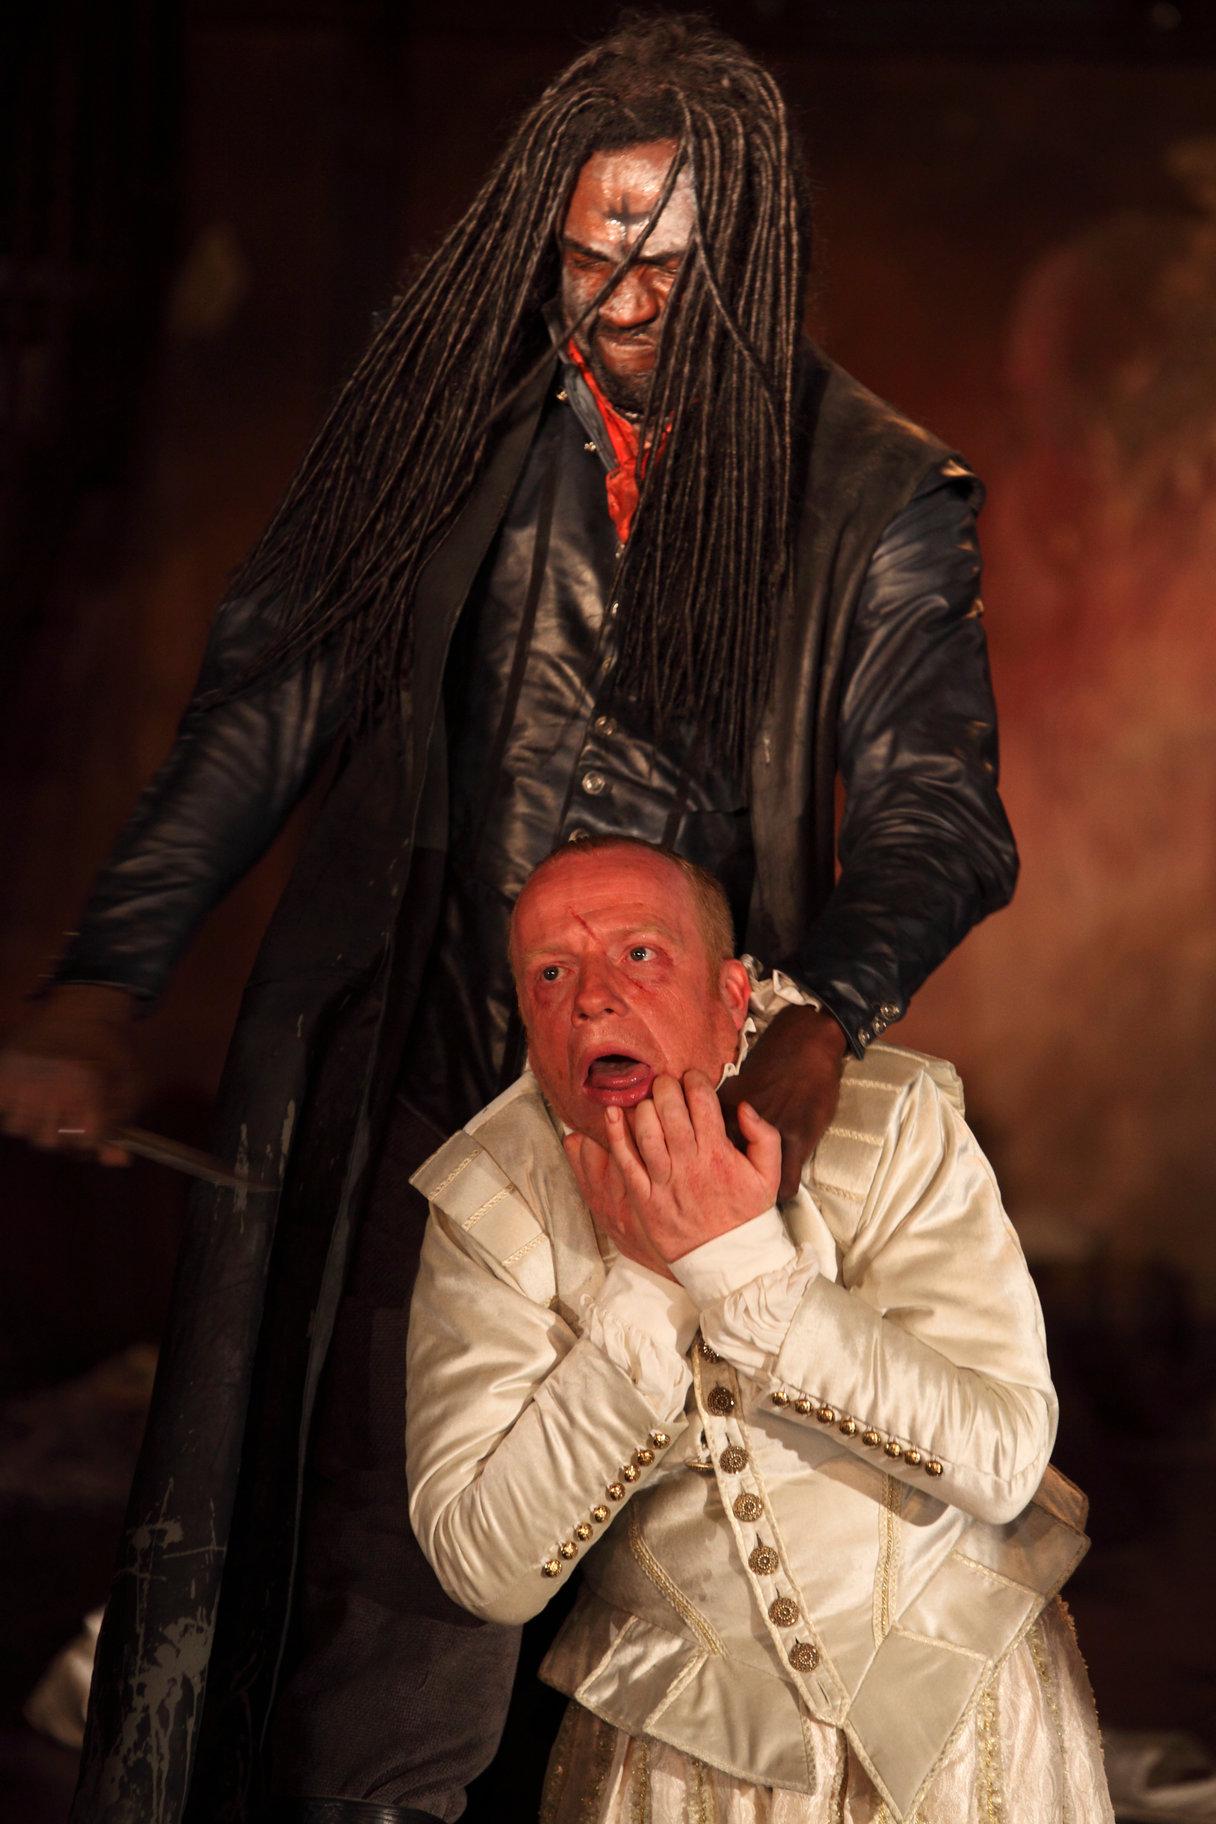 Banquo's ghost menaces Macbeth.